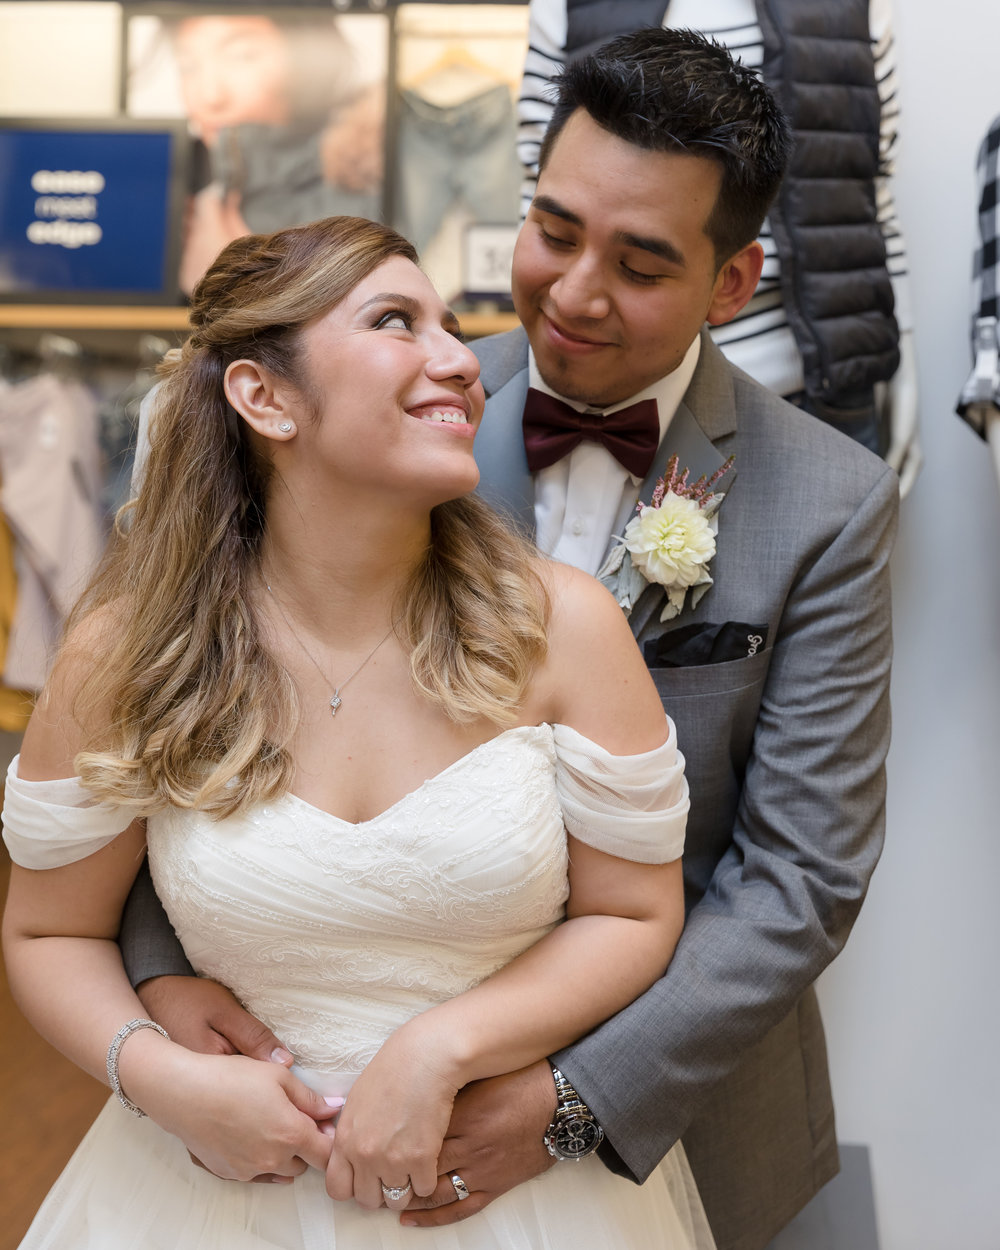 JVaughn_Photography_Weddings_Huntley_Photographer_Professional_Wedding0356.jpg